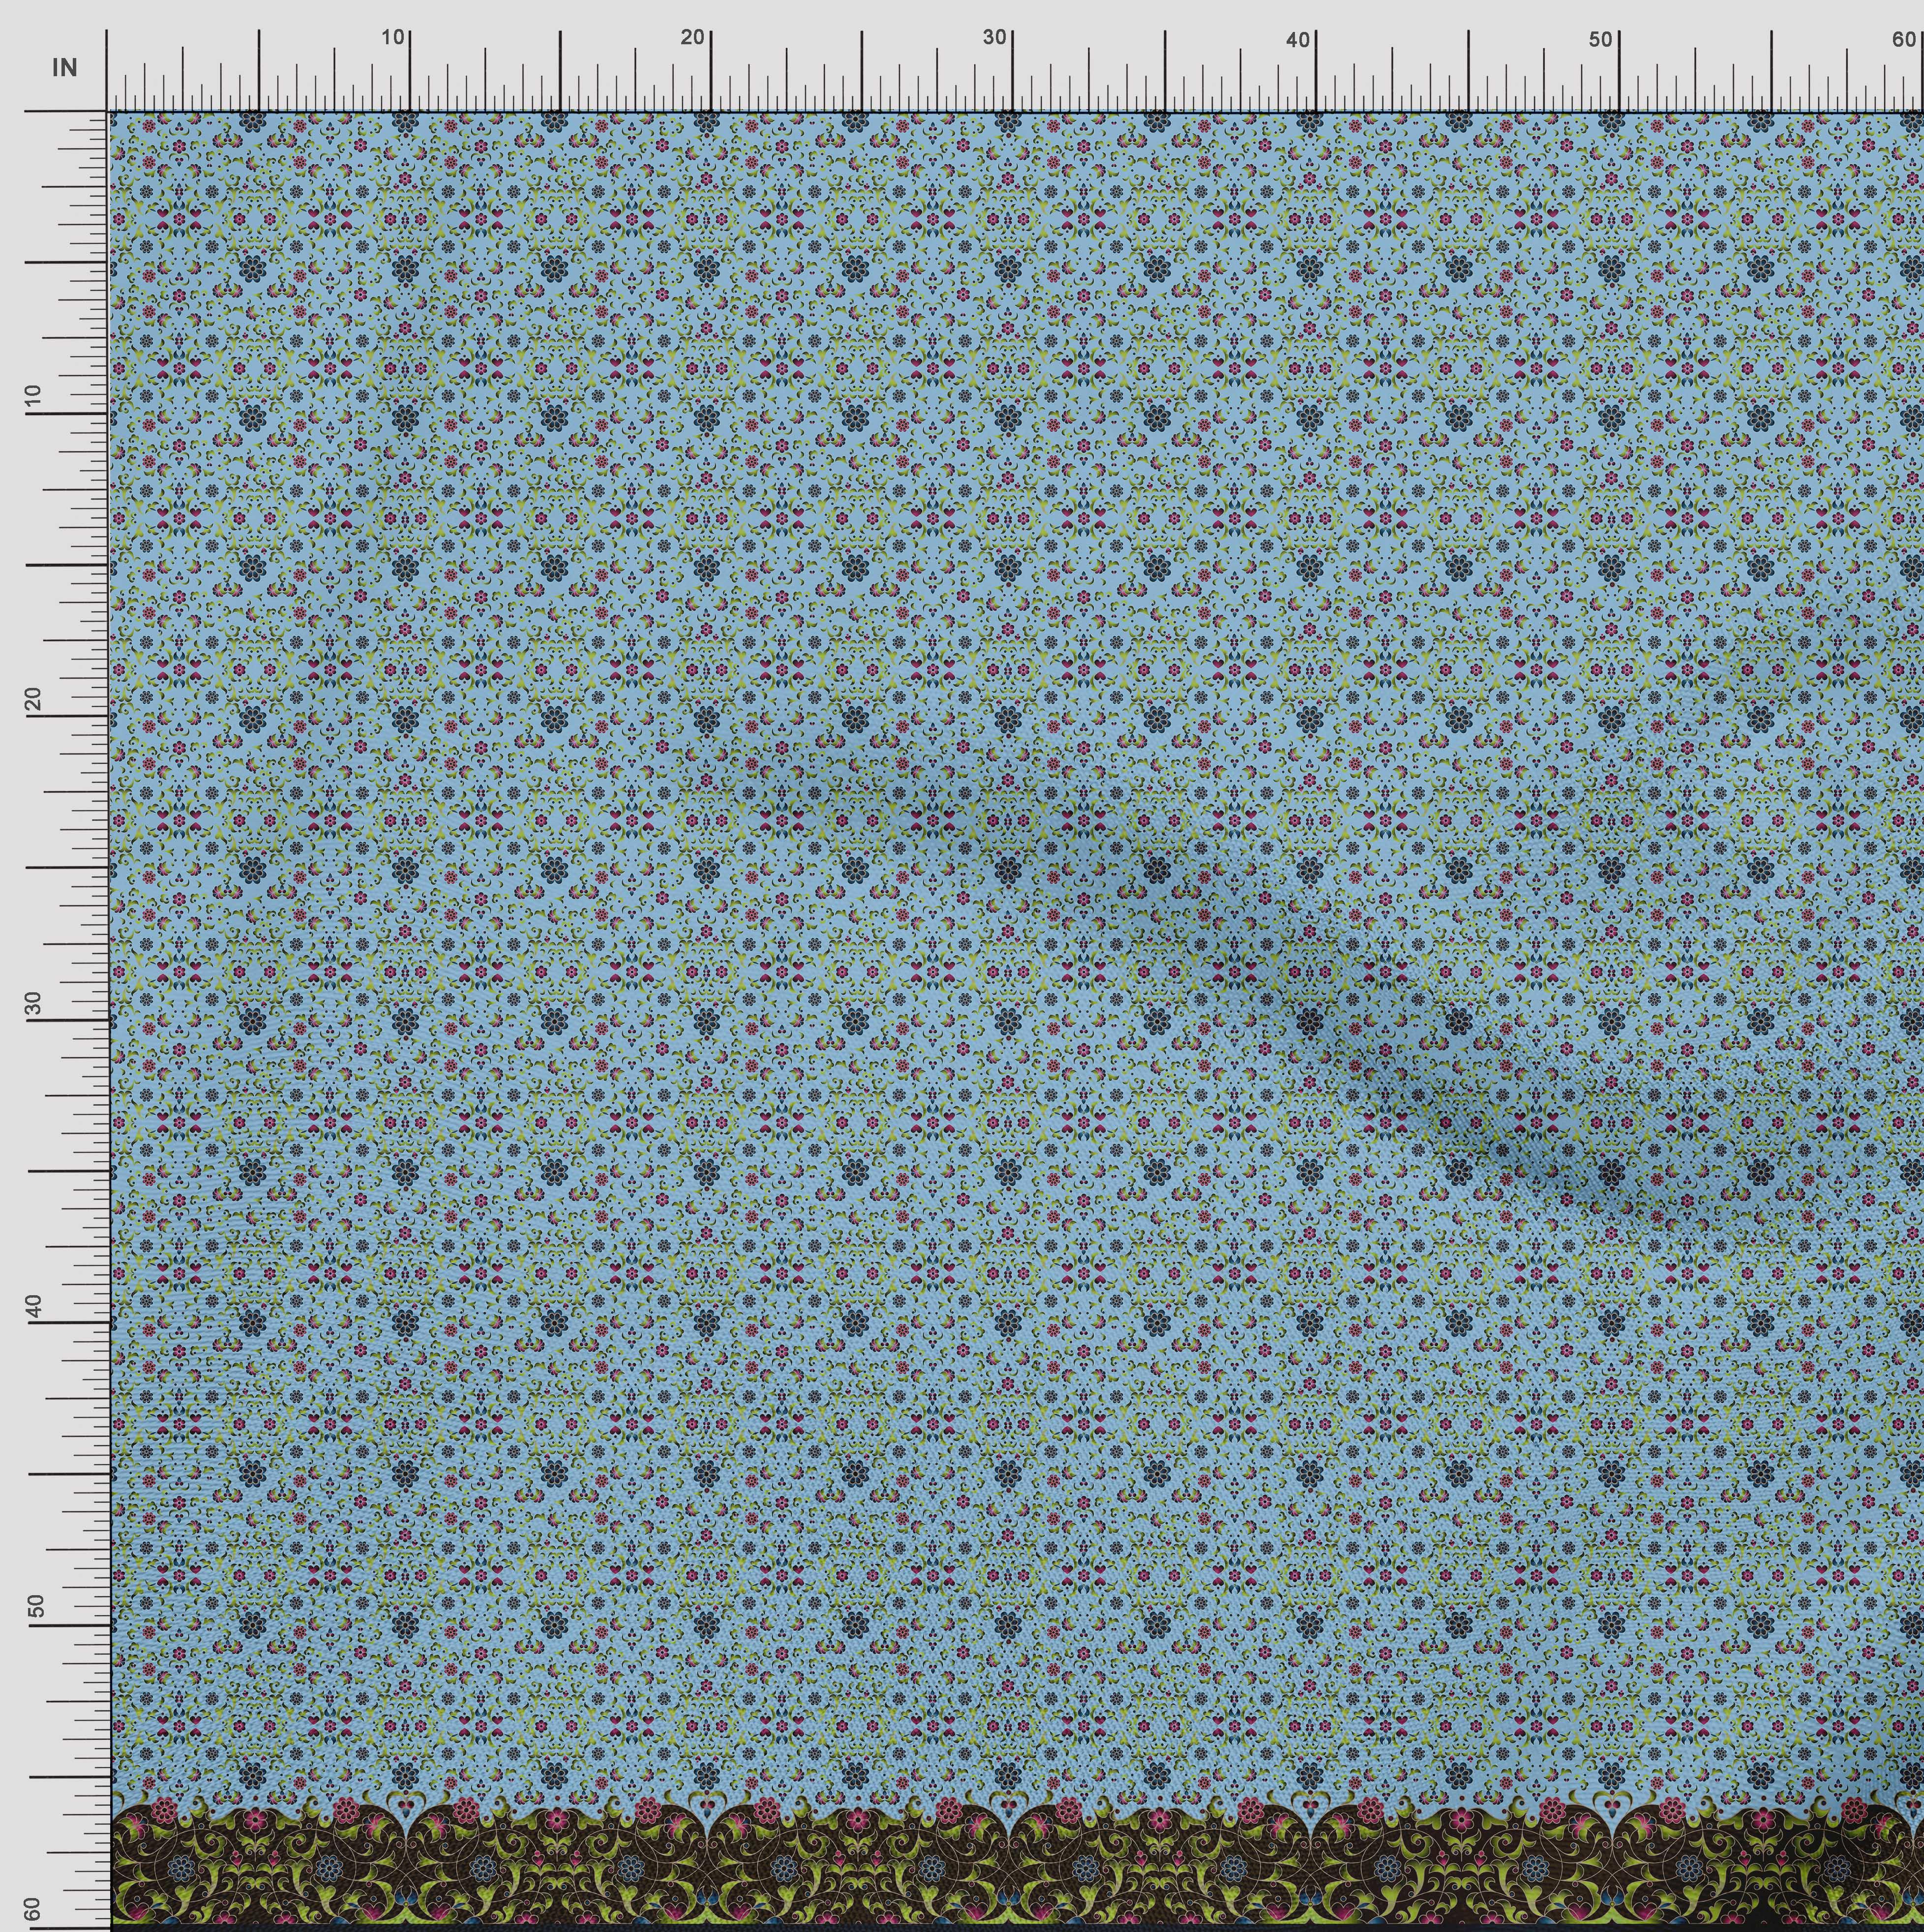 Soimoi-Cotton-Poplin-Fabric-Floral-amp-Leaves-Panel-Printed-Fabric-pGN thumbnail 4